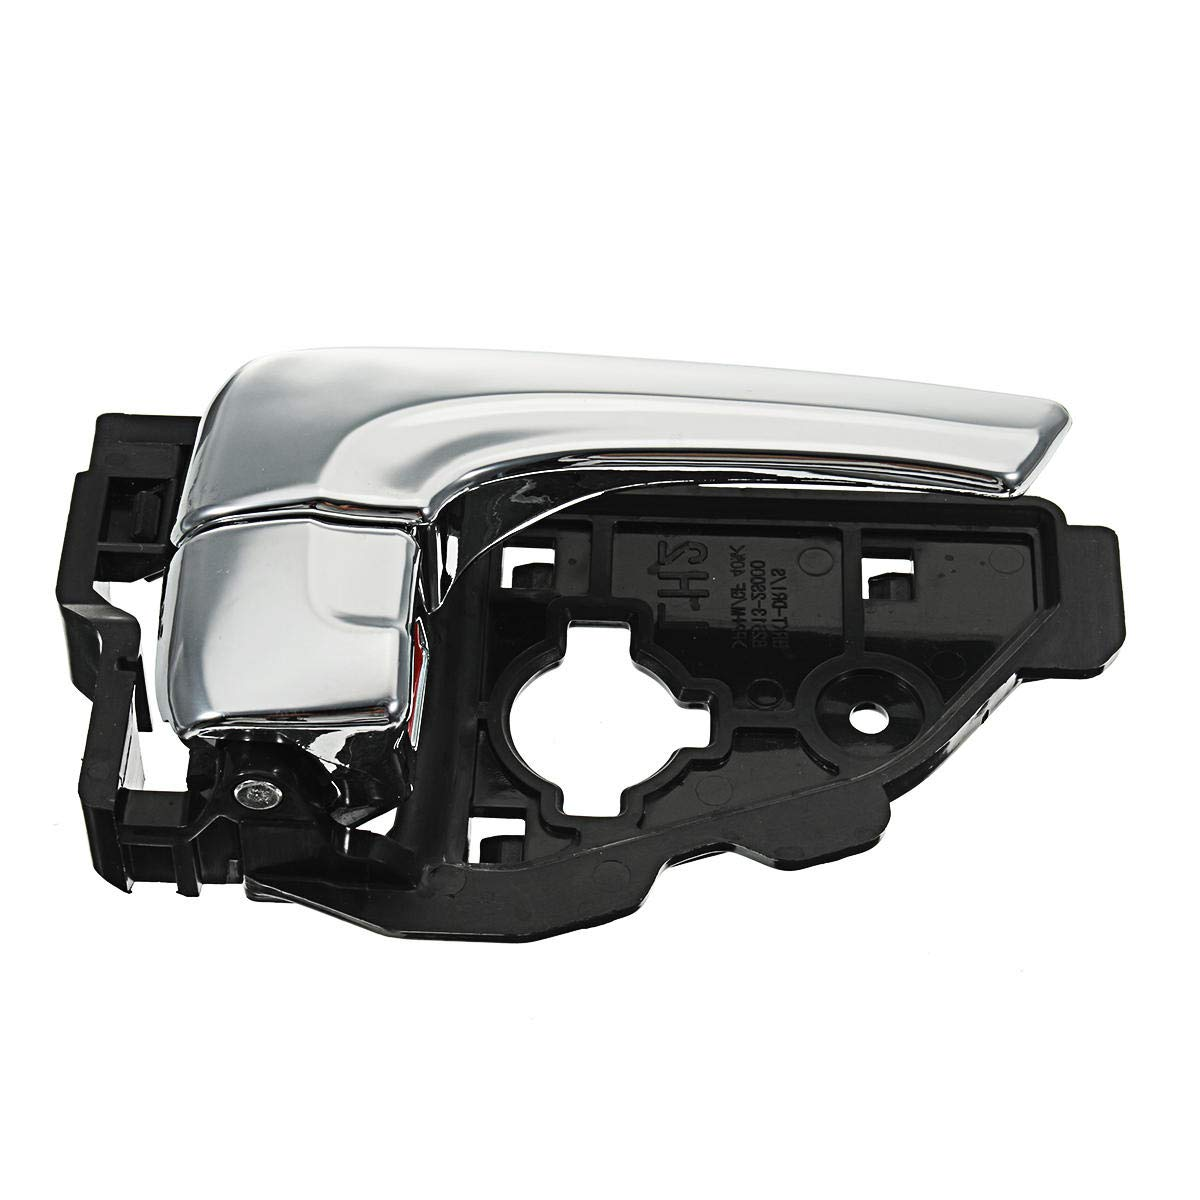 COD T/ürgriff f/ür Hyundai IX35 82610-2X010 Left 1